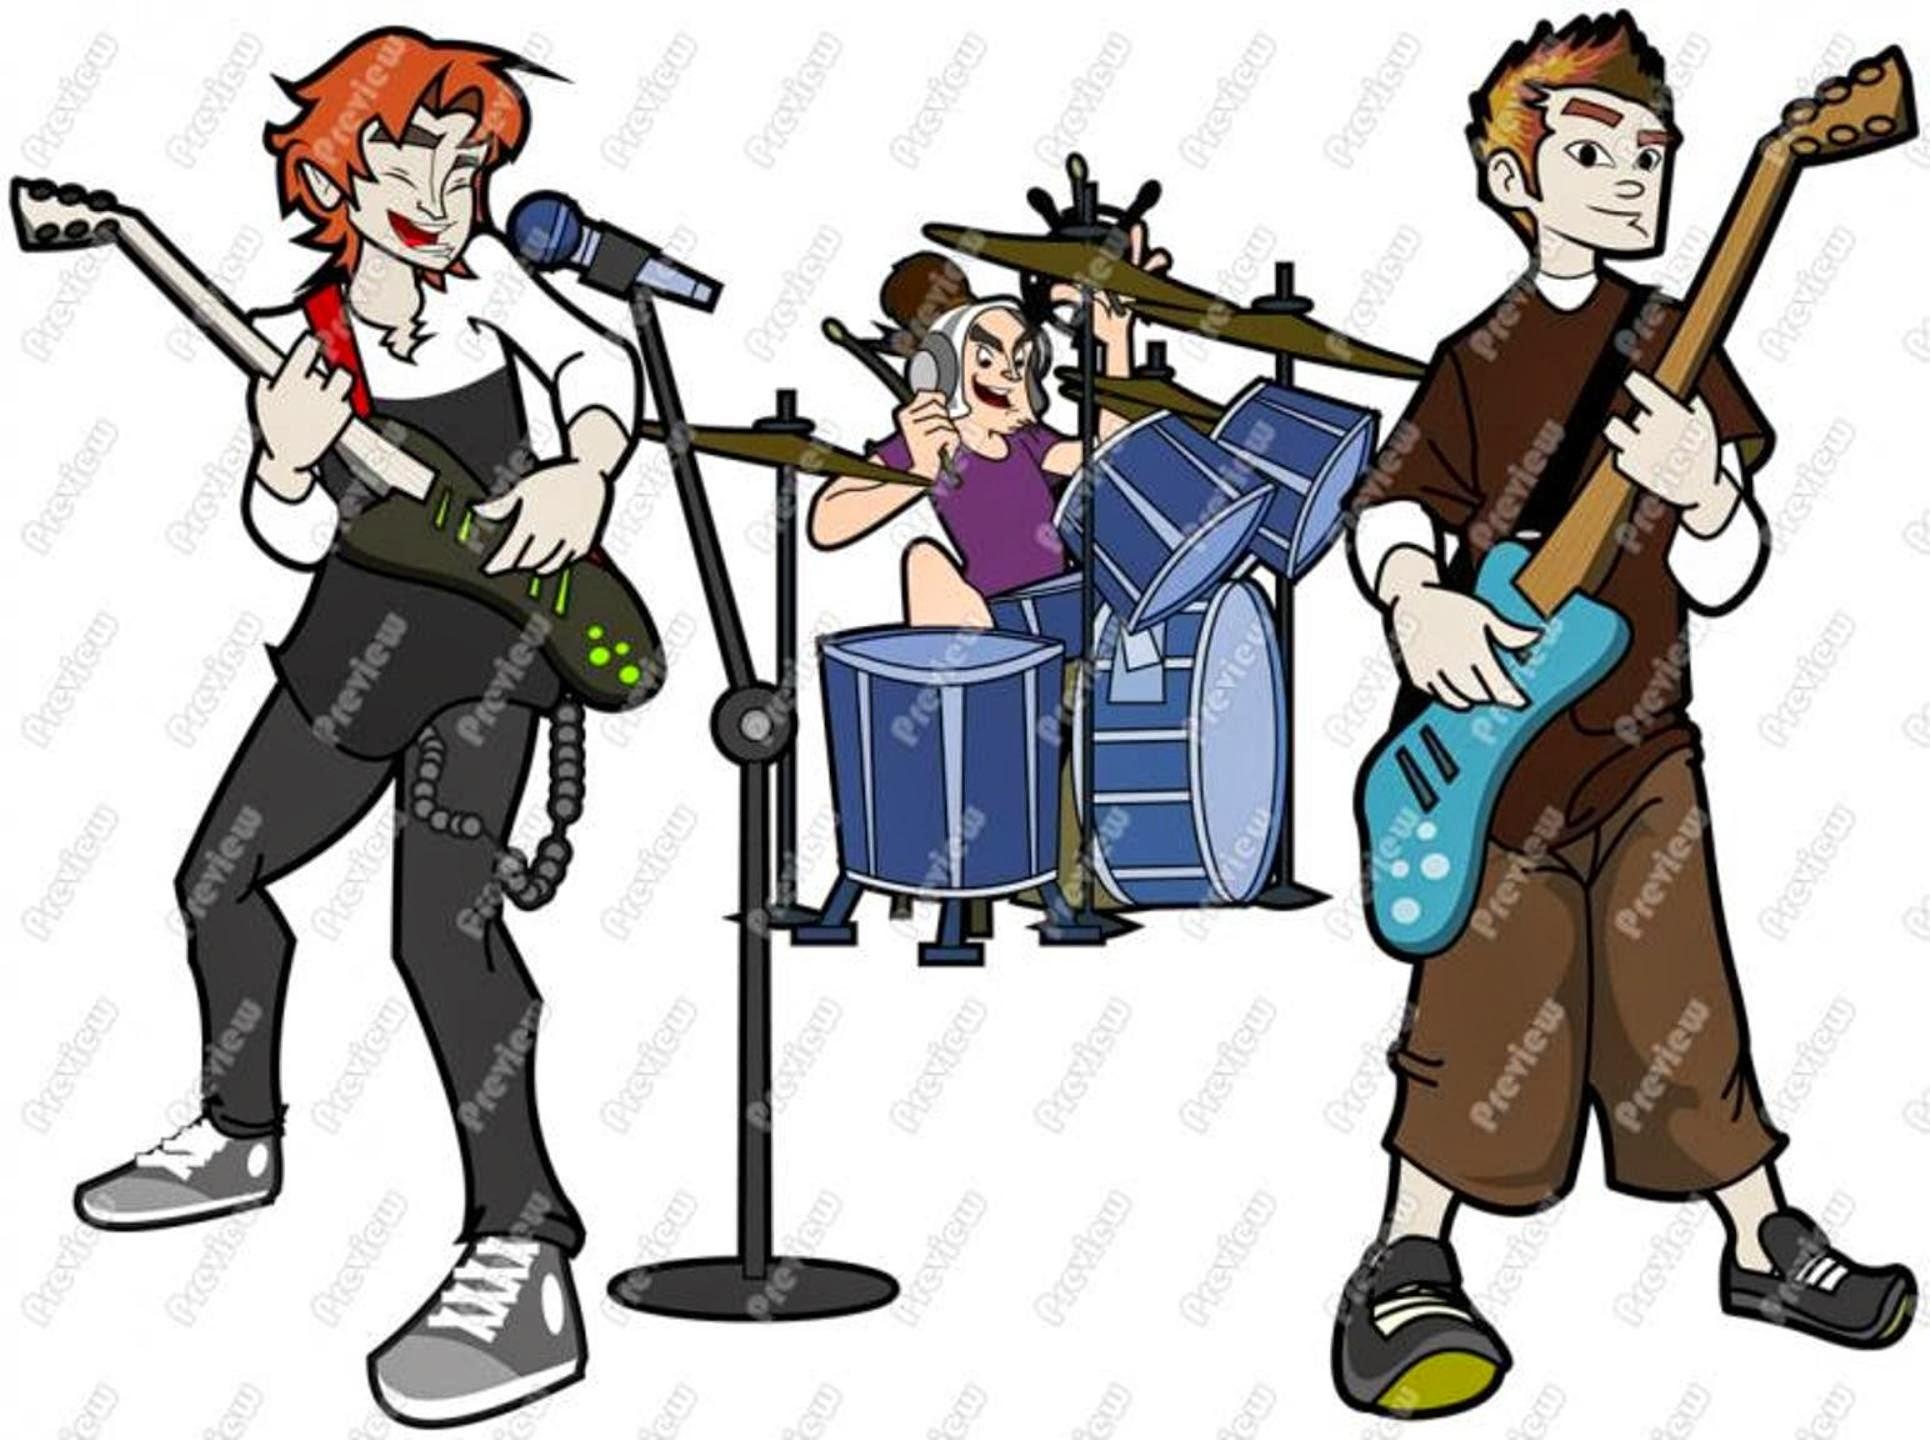 free cartoon rock band clipart - photo #1